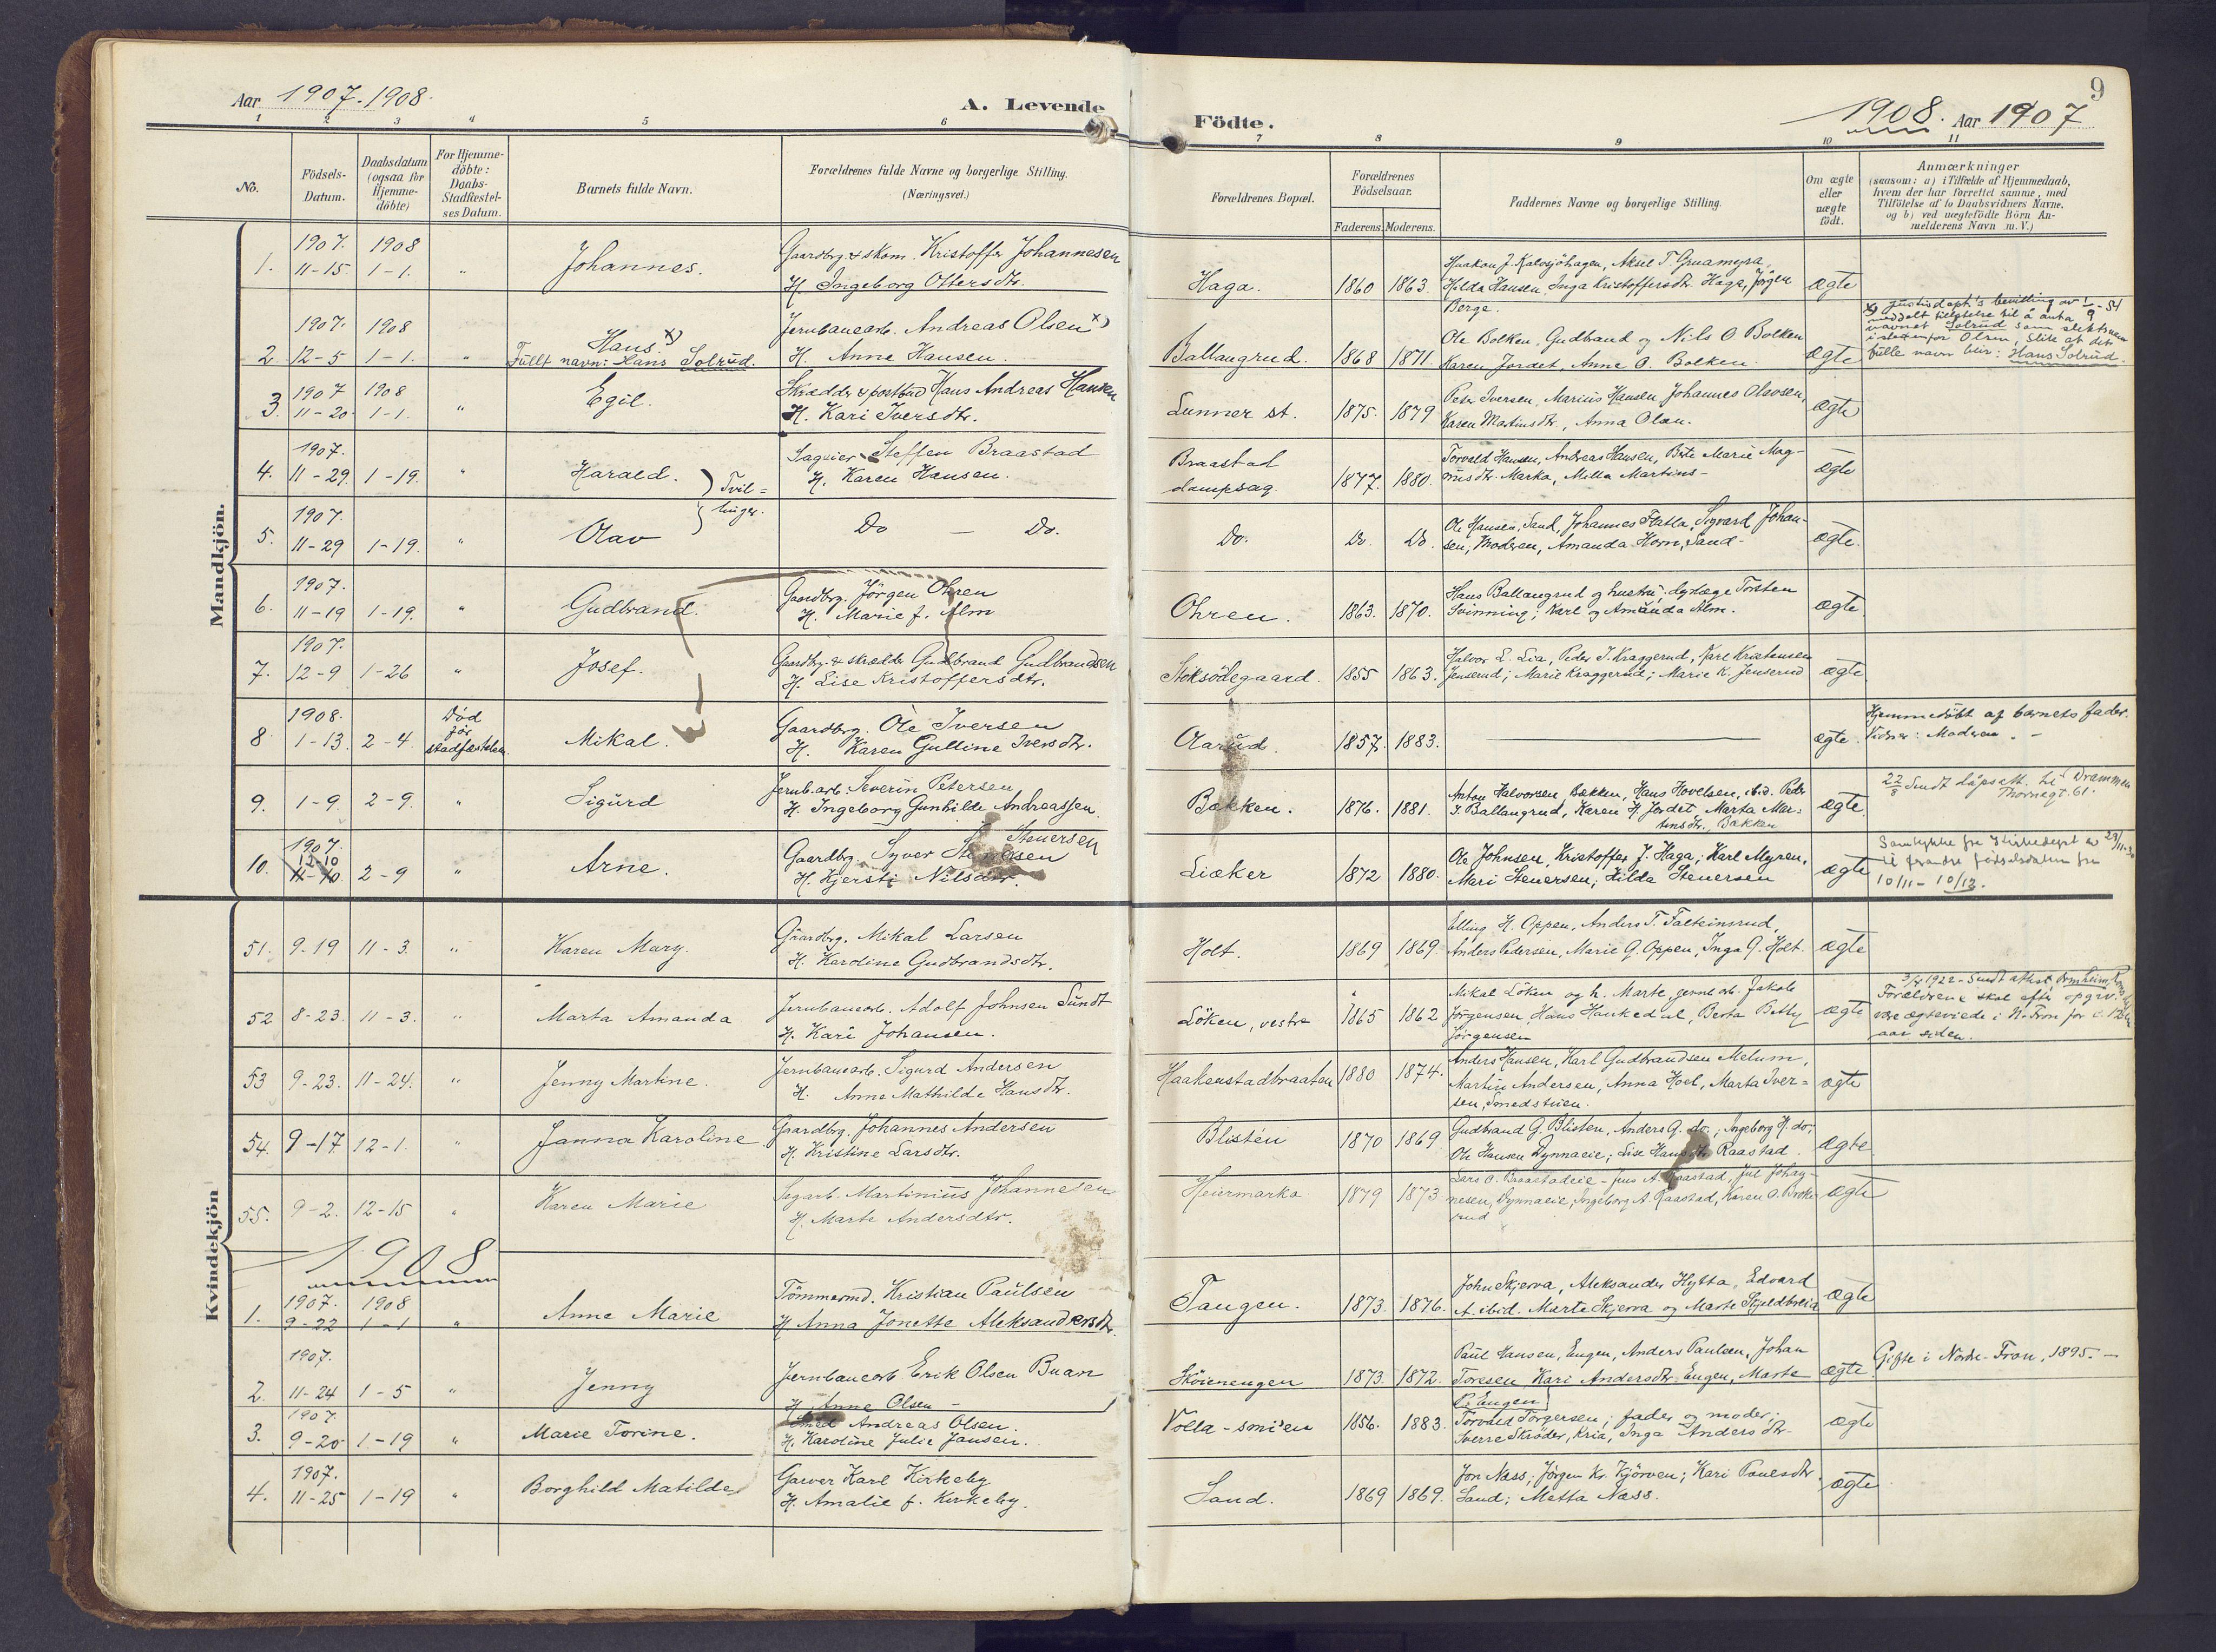 SAH, Lunner prestekontor, H/Ha/Haa/L0001: Ministerialbok nr. 1, 1907-1922, s. 9